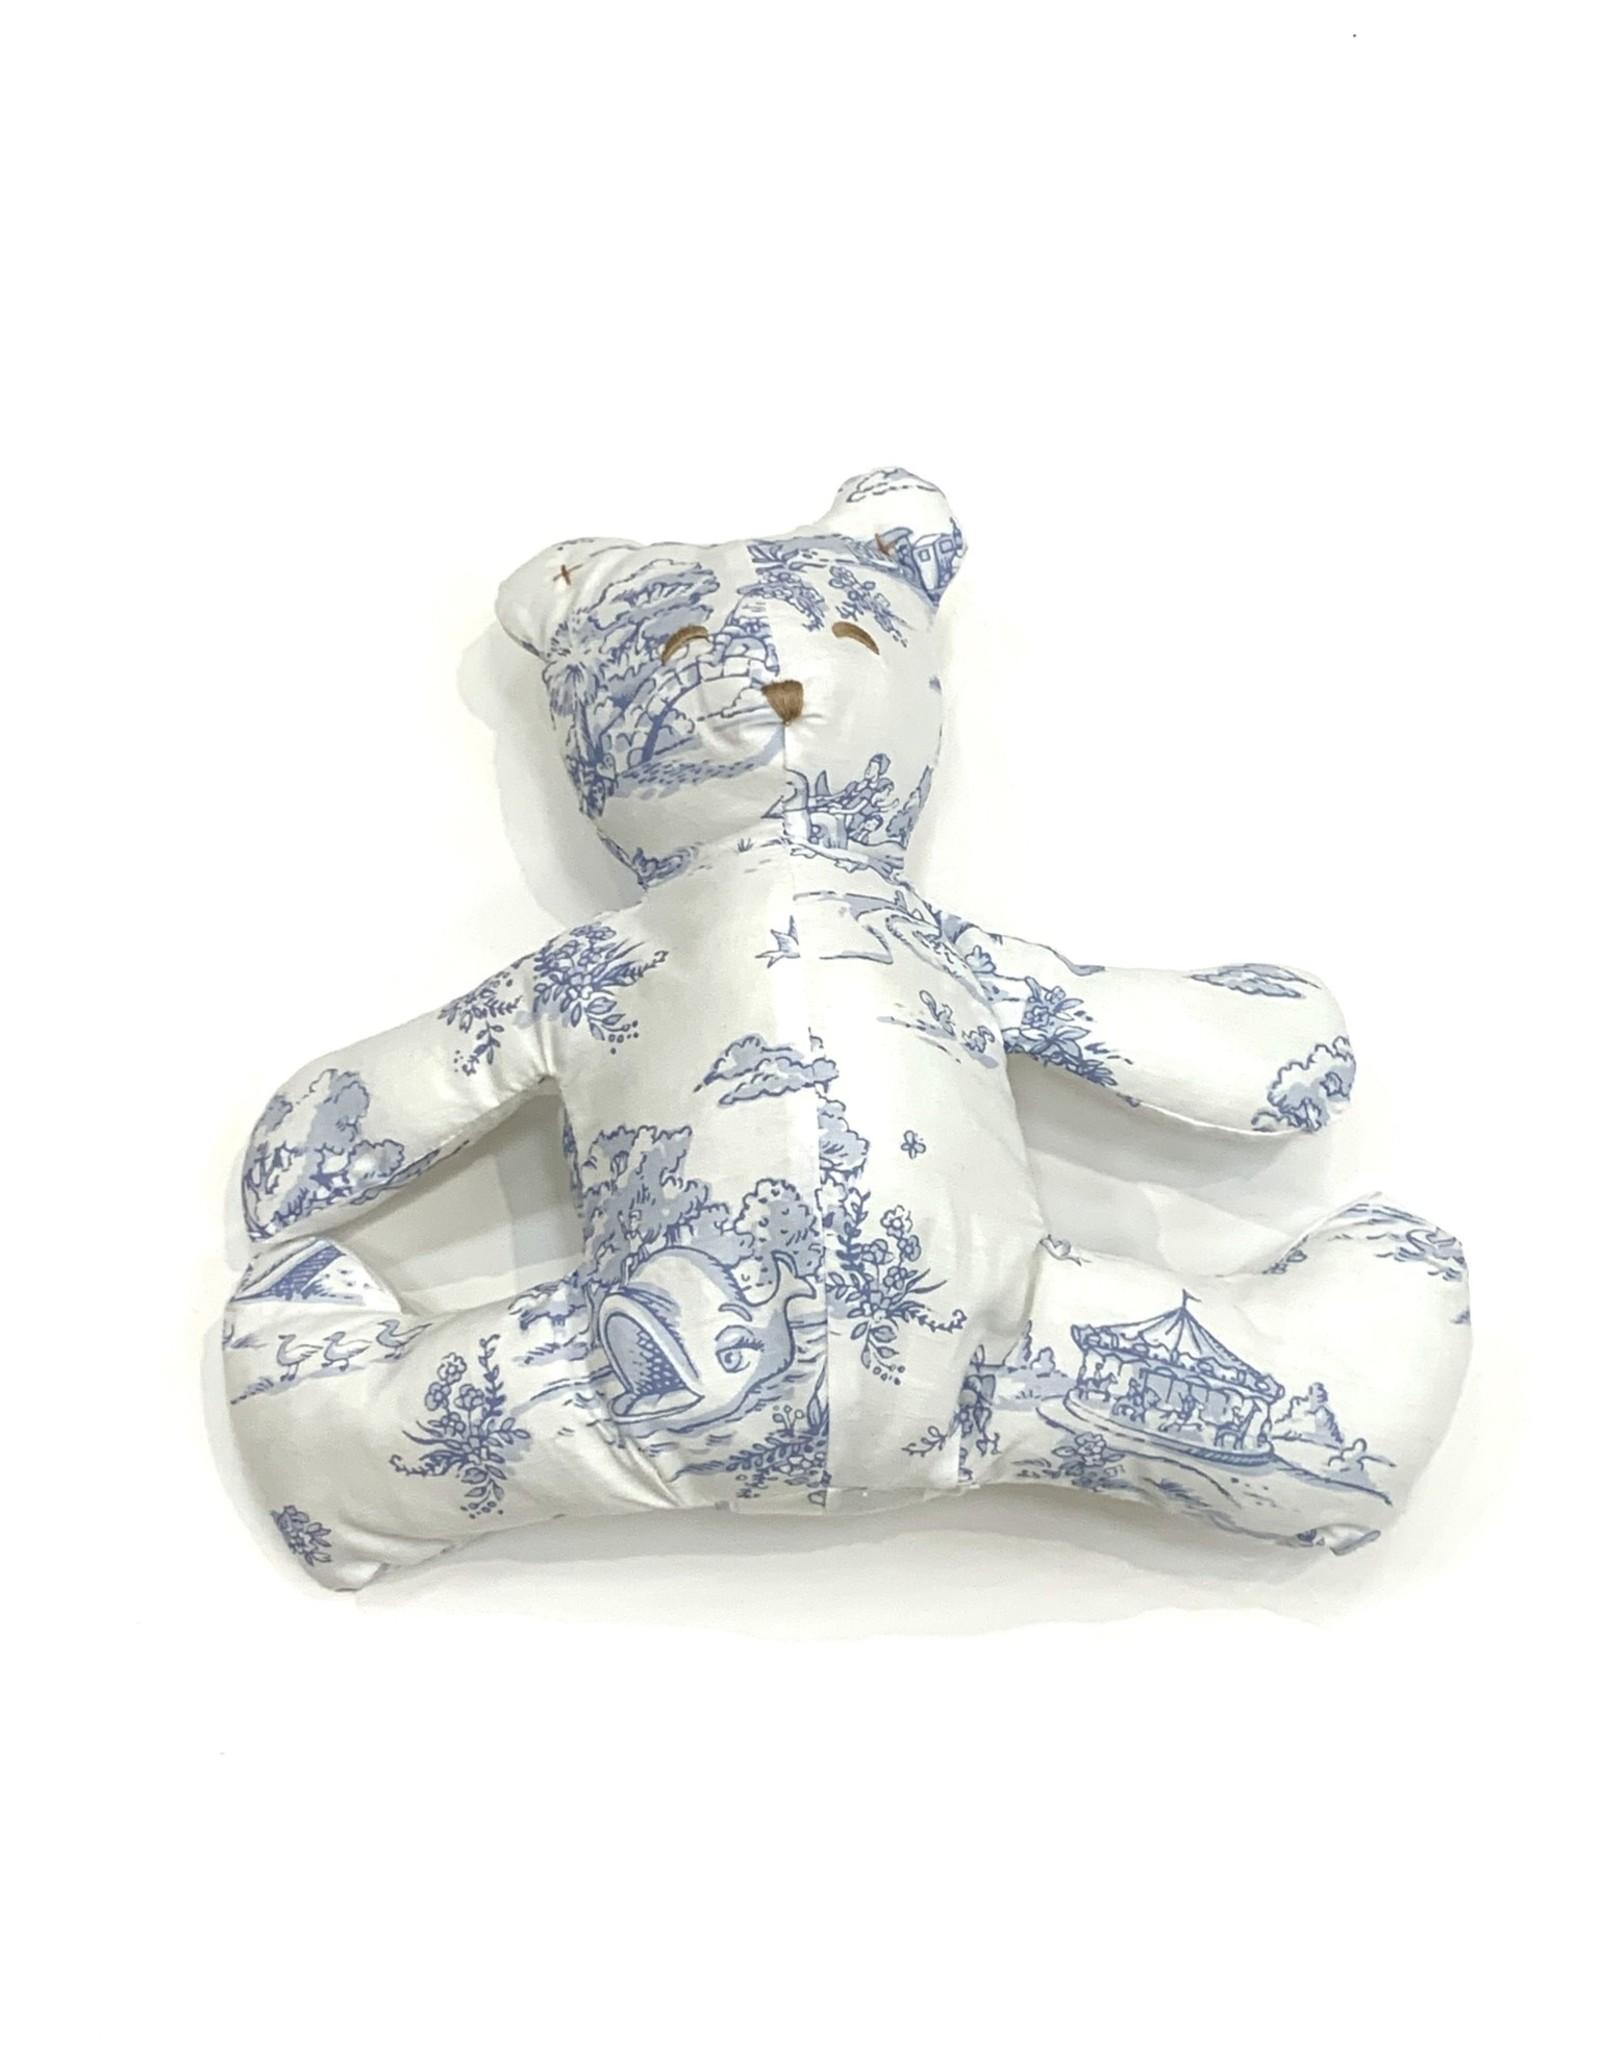 Maison Nola Toile Bear Blue